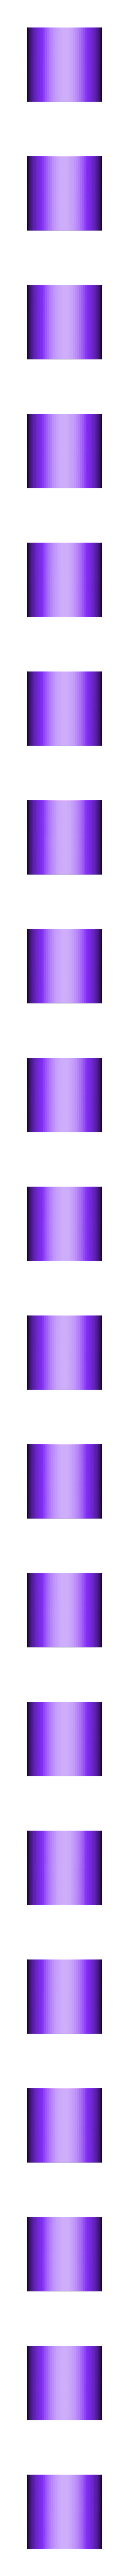 Bearing_6mm_v7_Bearing_6mm_v7_dampener_.stl Download free STL file Bearing Plate for Turntable • 3D printer design, mathiaspl20